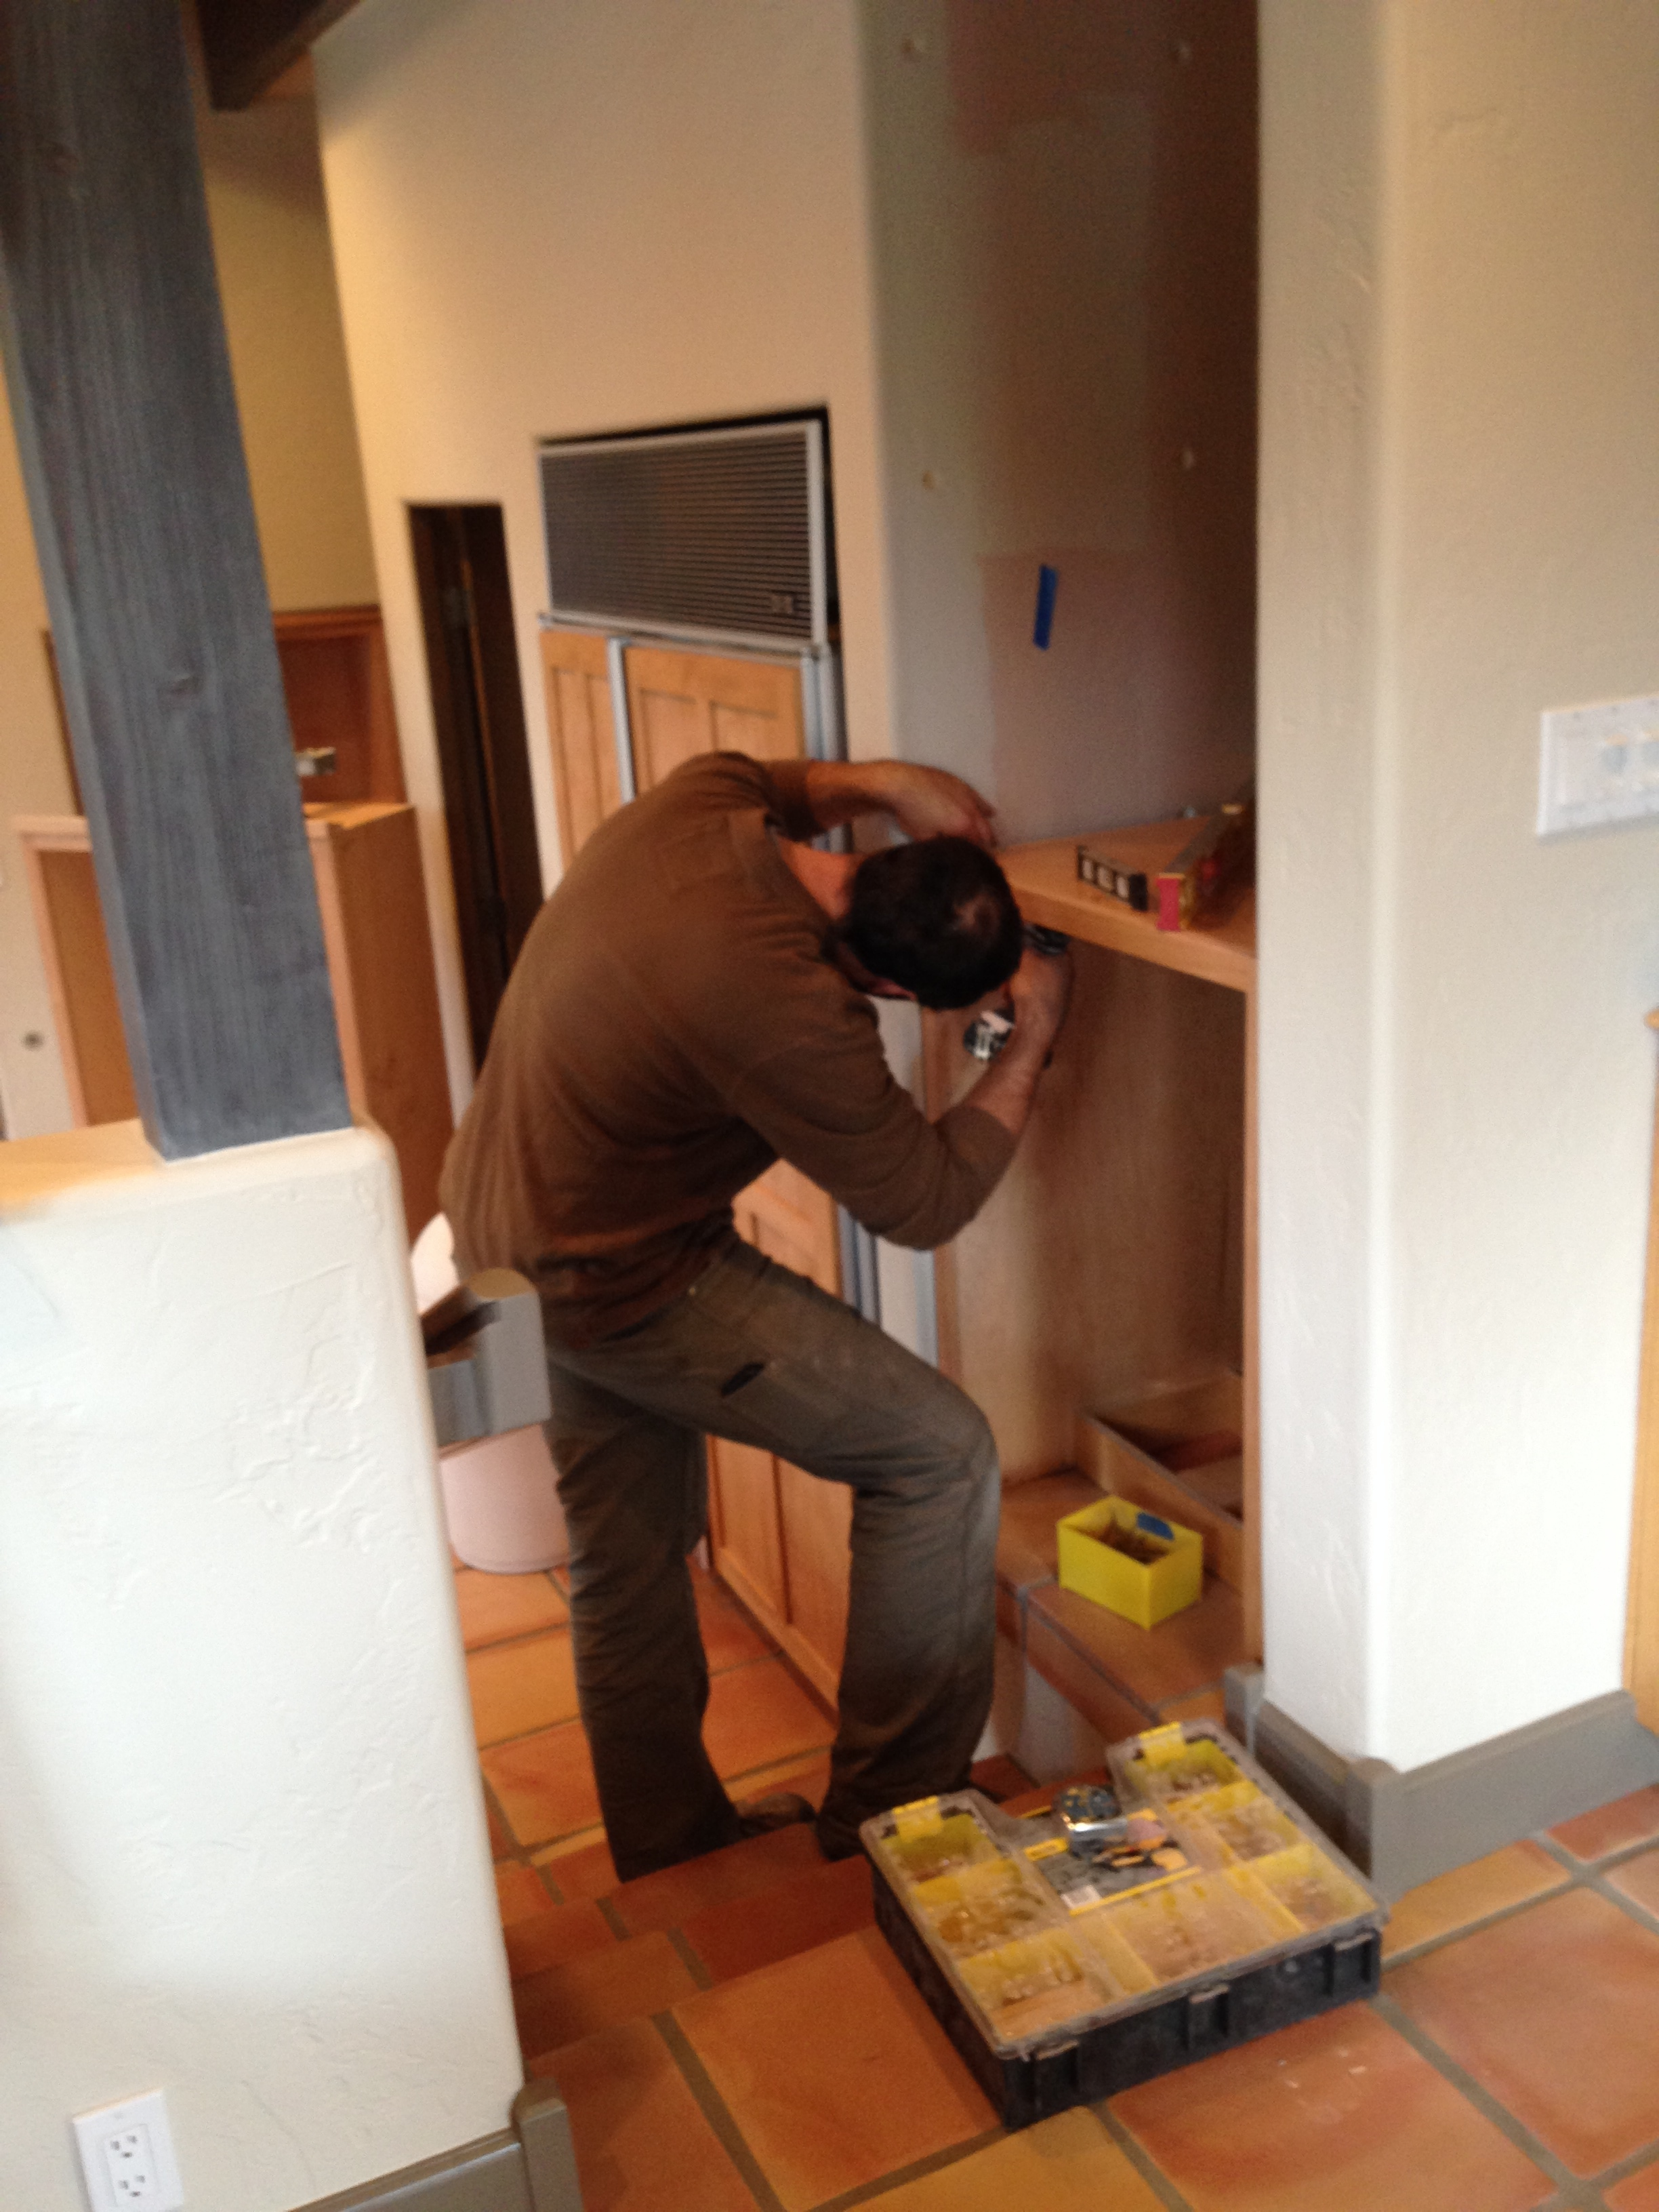 Matt installs the base cabinet level and plumb.